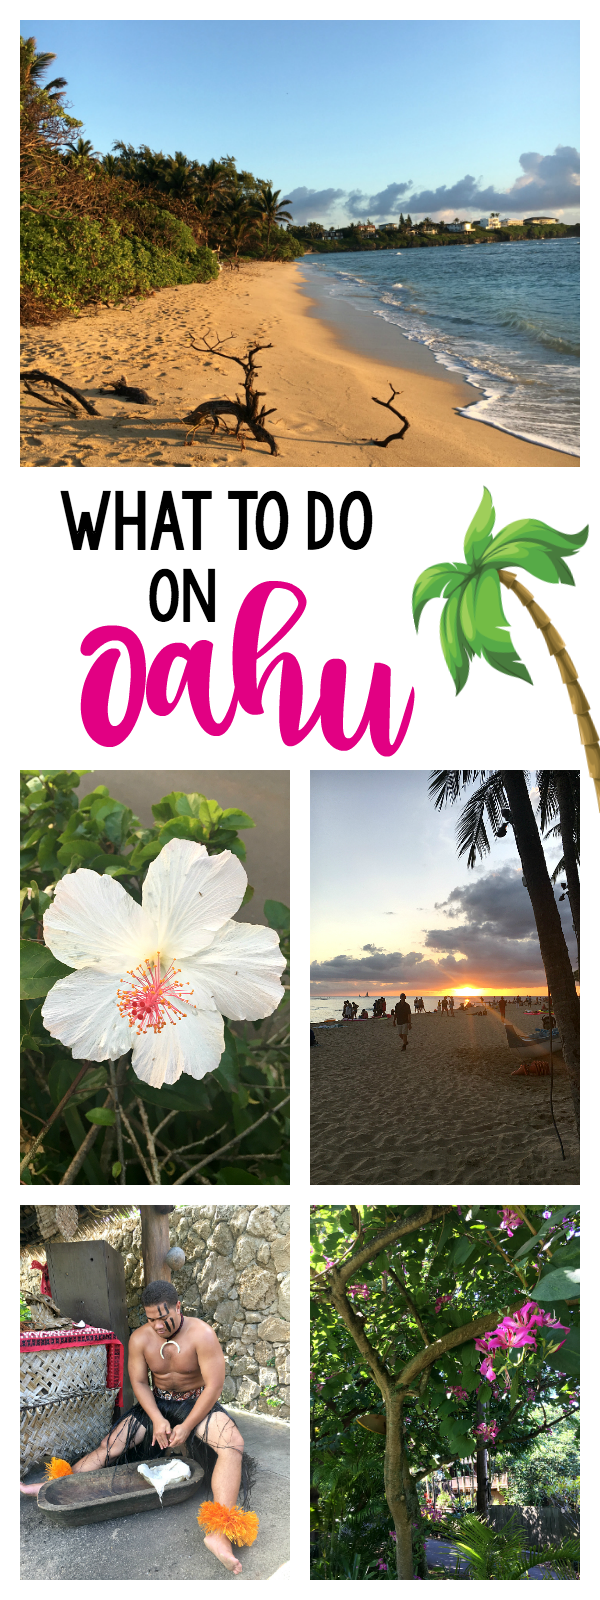 Fun Things to do on Oahu